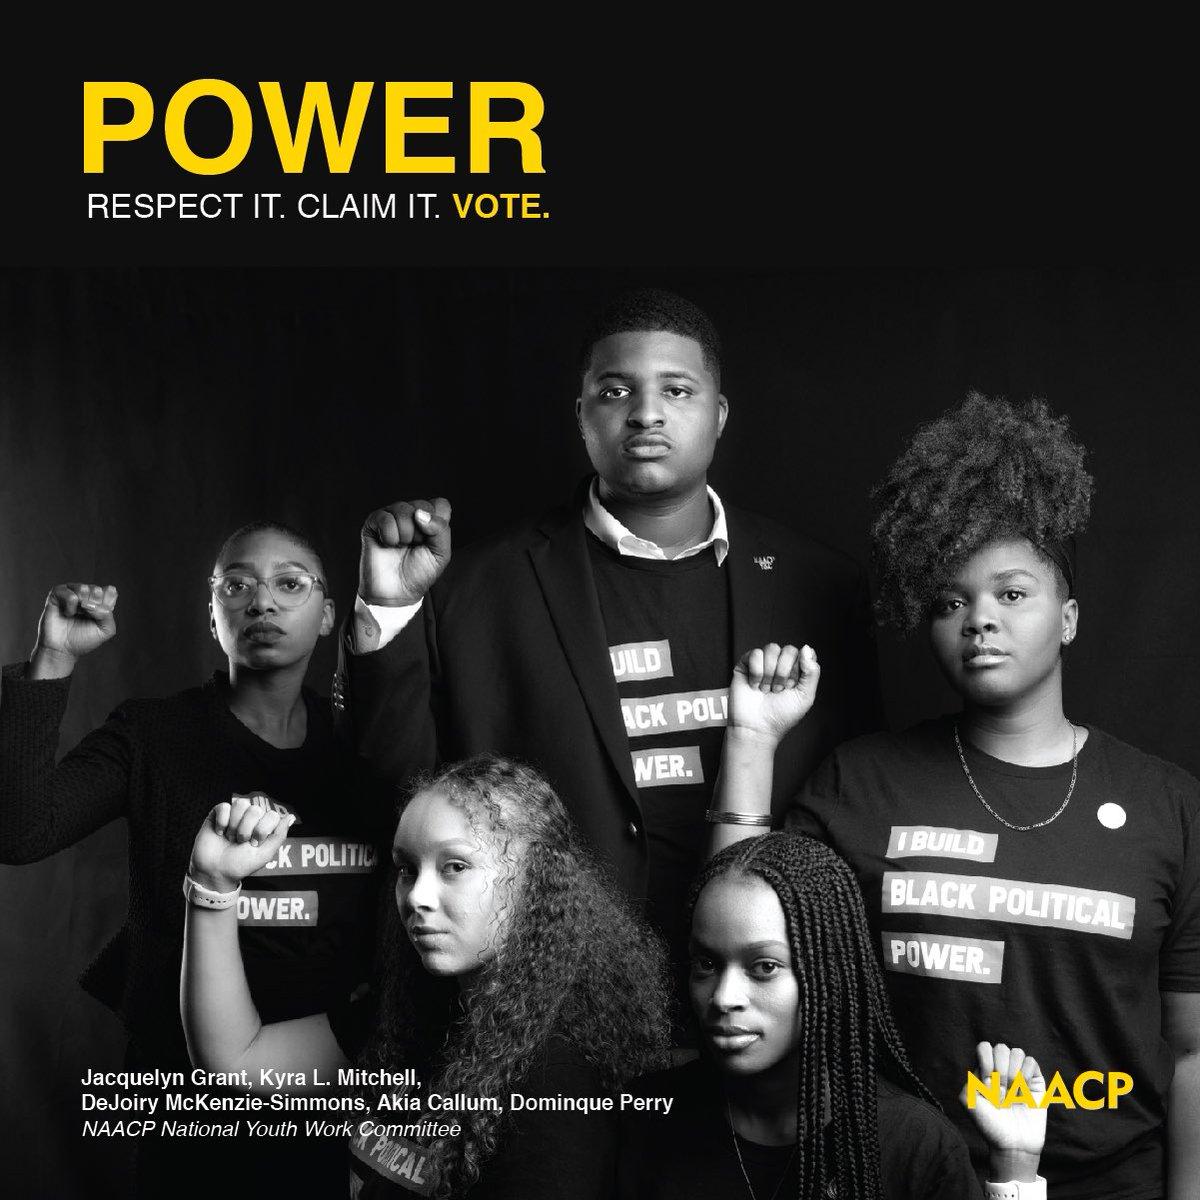 Power: Respect It. Claim It. VOTE.